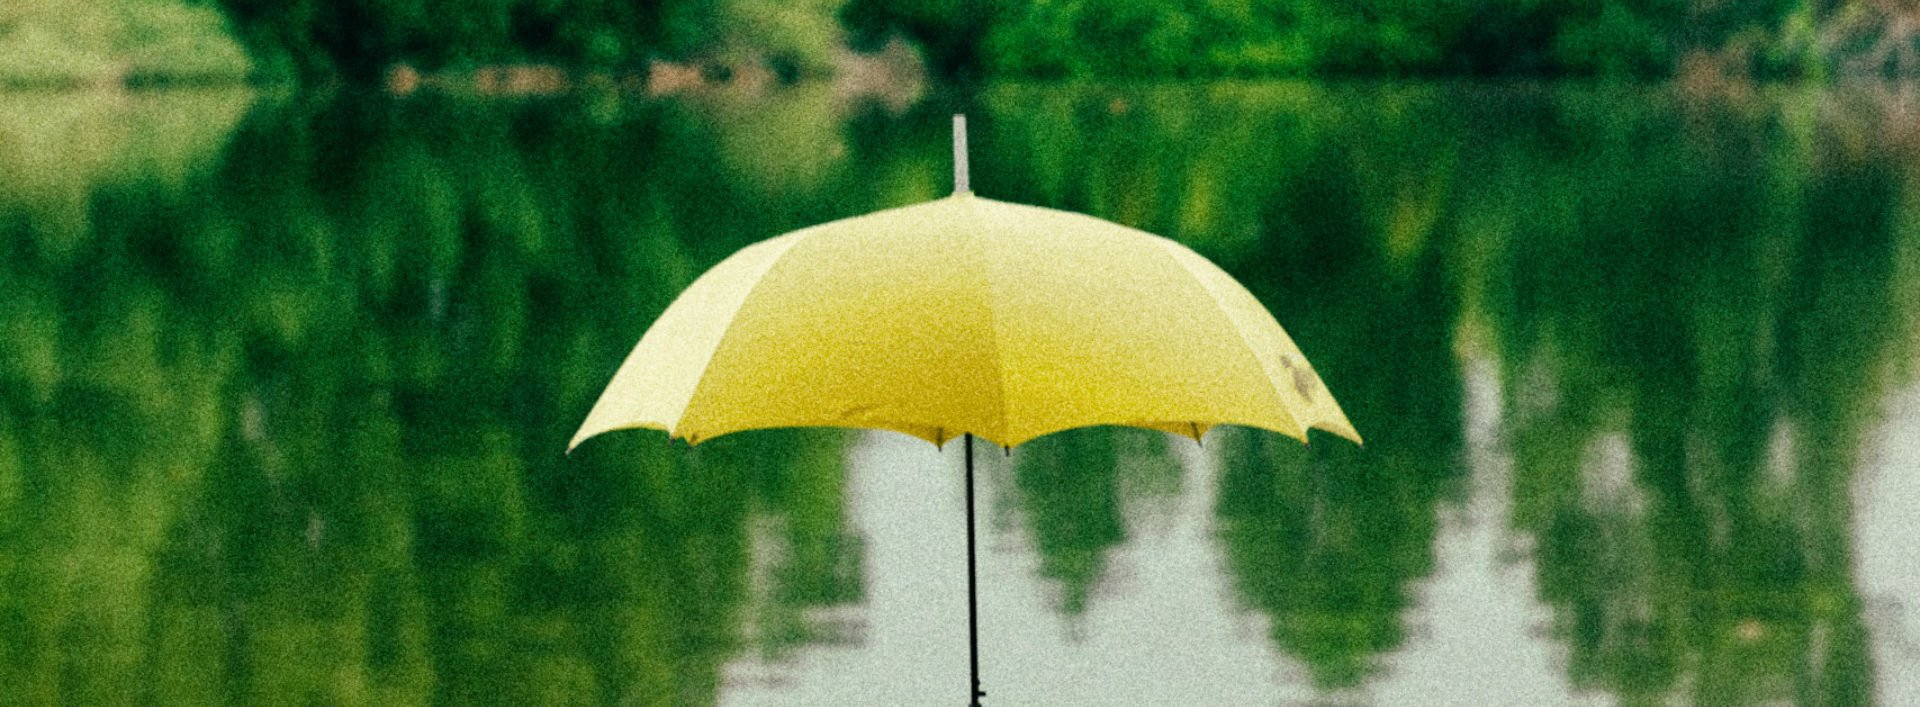 A or an yellow umbrella in a green lake.